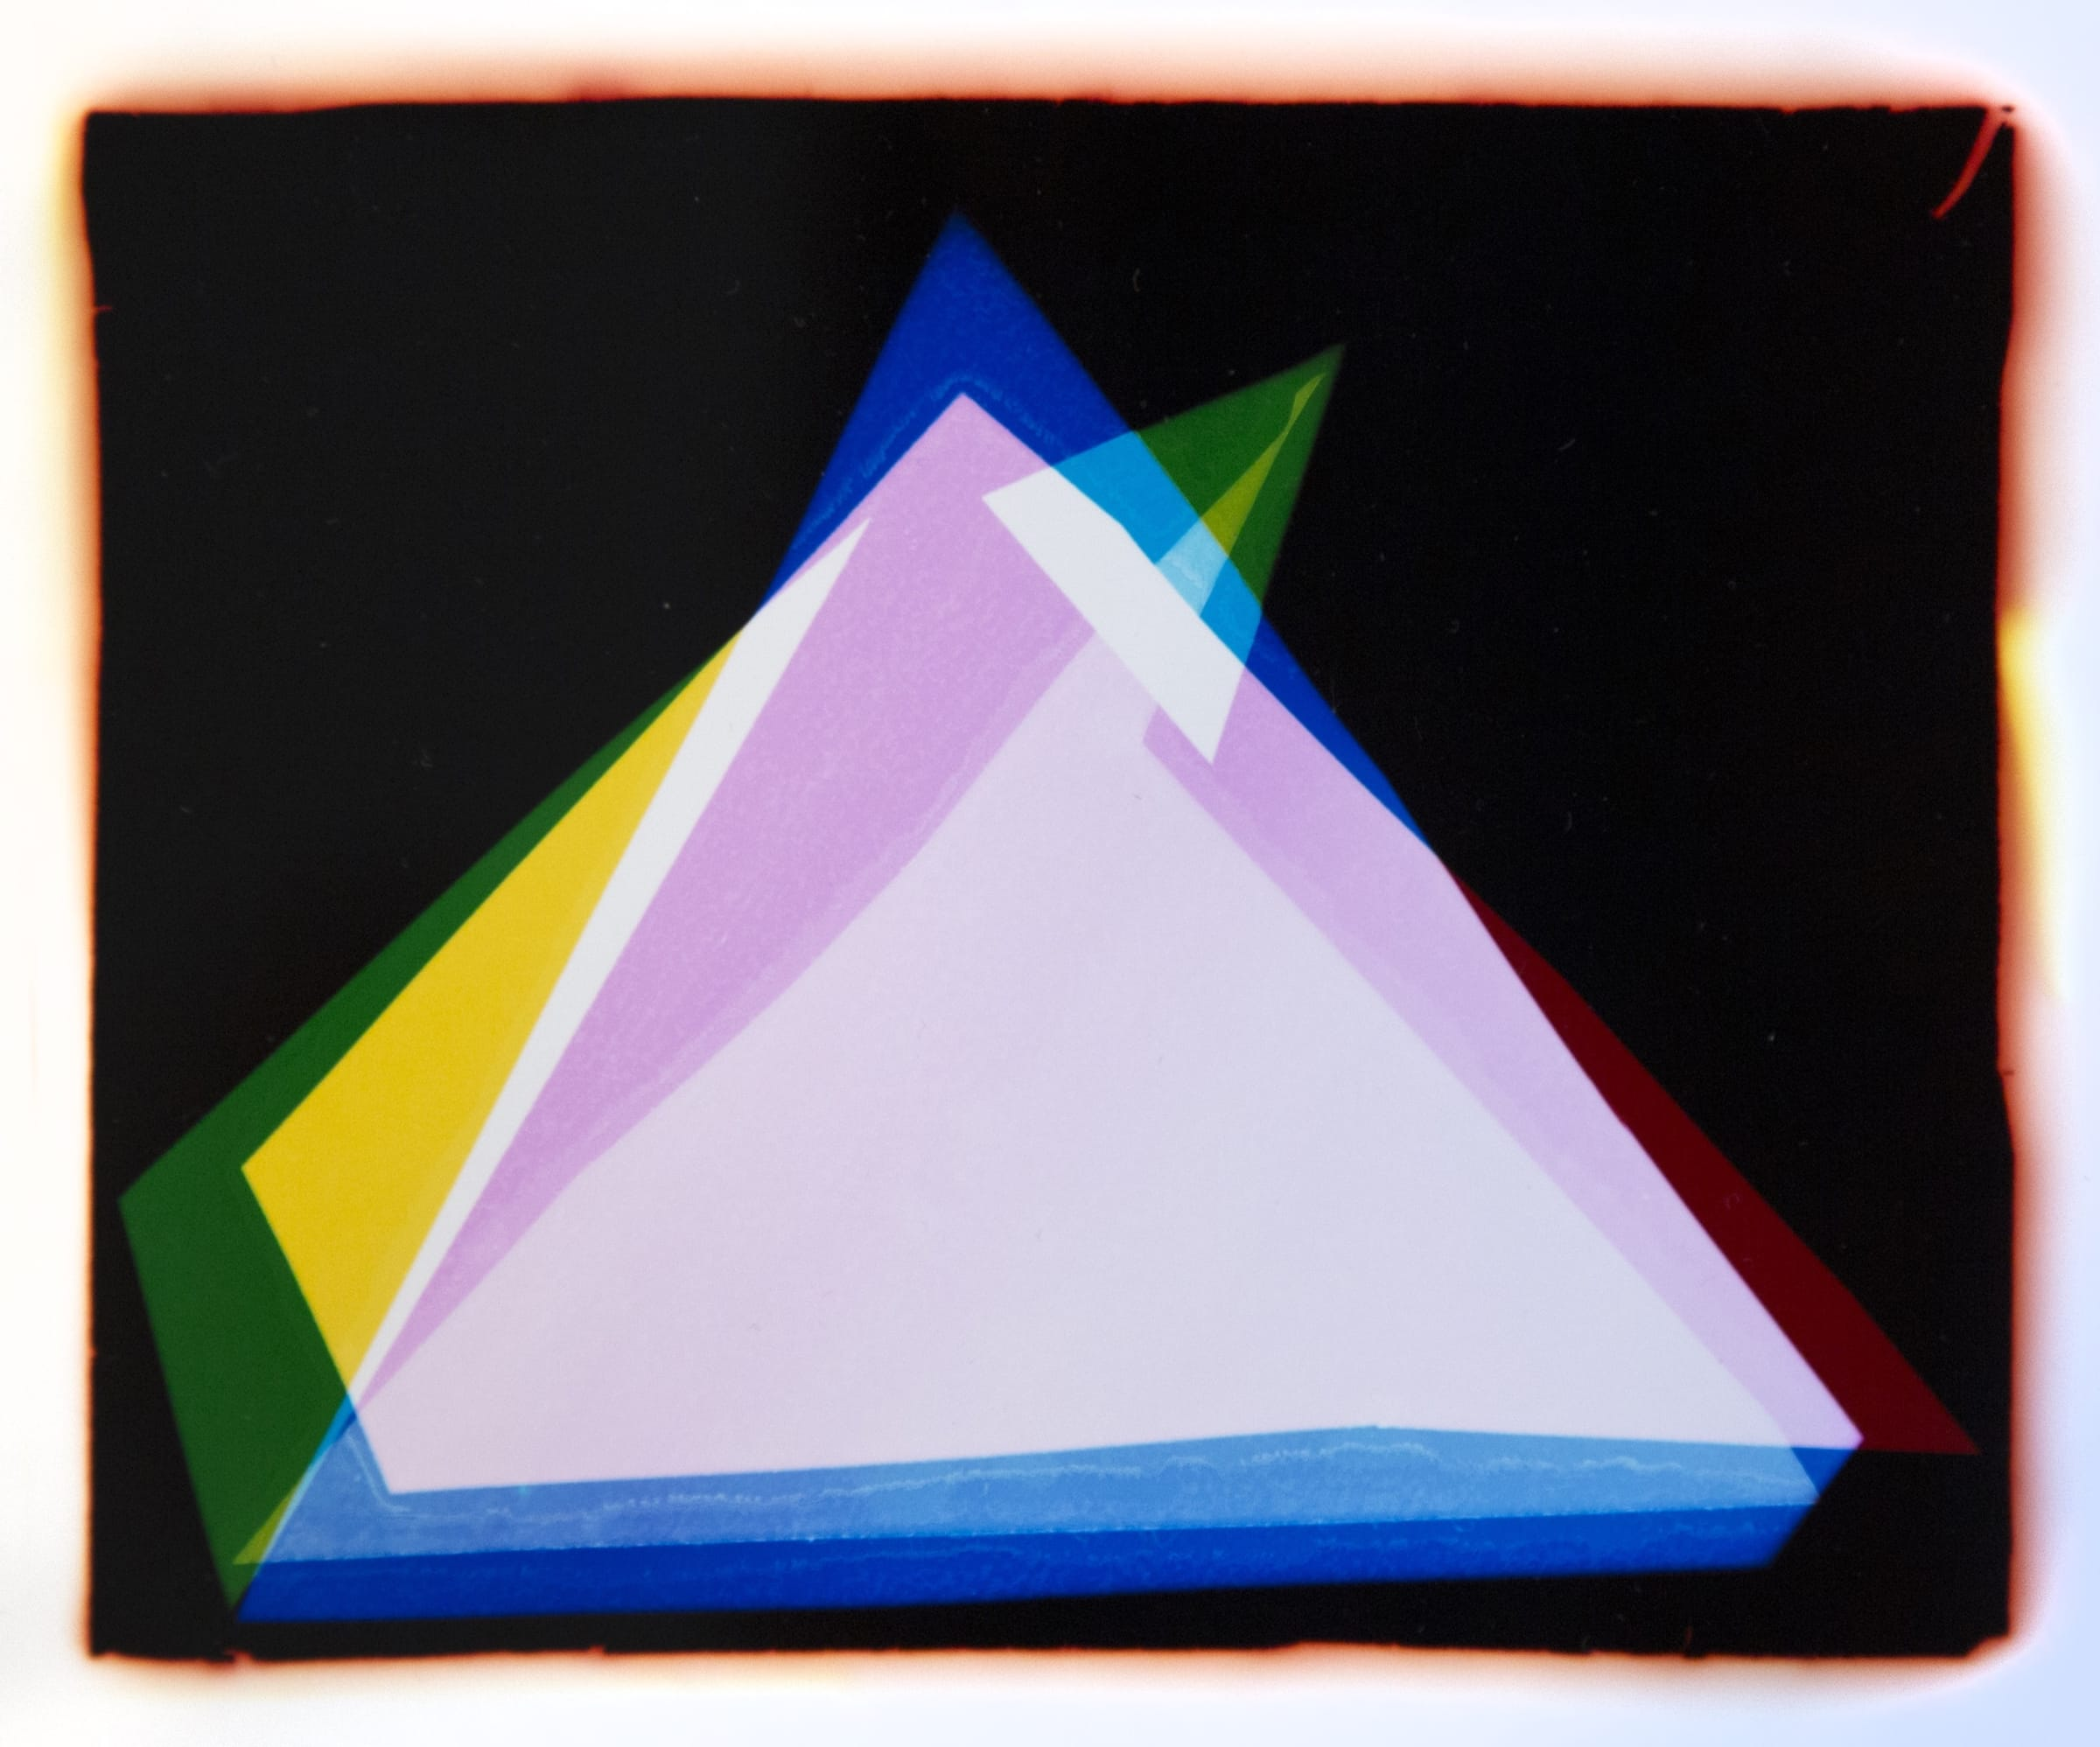 "<span class=""link fancybox-details-link""><a href=""/artists/26-liz-nielsen/works/353-liz-nielsen-pyramid-dimension-2019/"">View Detail Page</a></span><div class=""artist""><strong>Liz Nielsen</strong></div> <div class=""title""><em>Pyramid Dimension</em>, 2019</div> <div class=""medium"">Analogue Chromogenic Photogram on Fujiflex<br /> Unique</div> <div class=""dimensions"">10.2 x 12.7 cm<br /> 4 x 5 in<br /> Print only</div><div class=""copyright_line"">Copyright Liz Nielsen</div>"